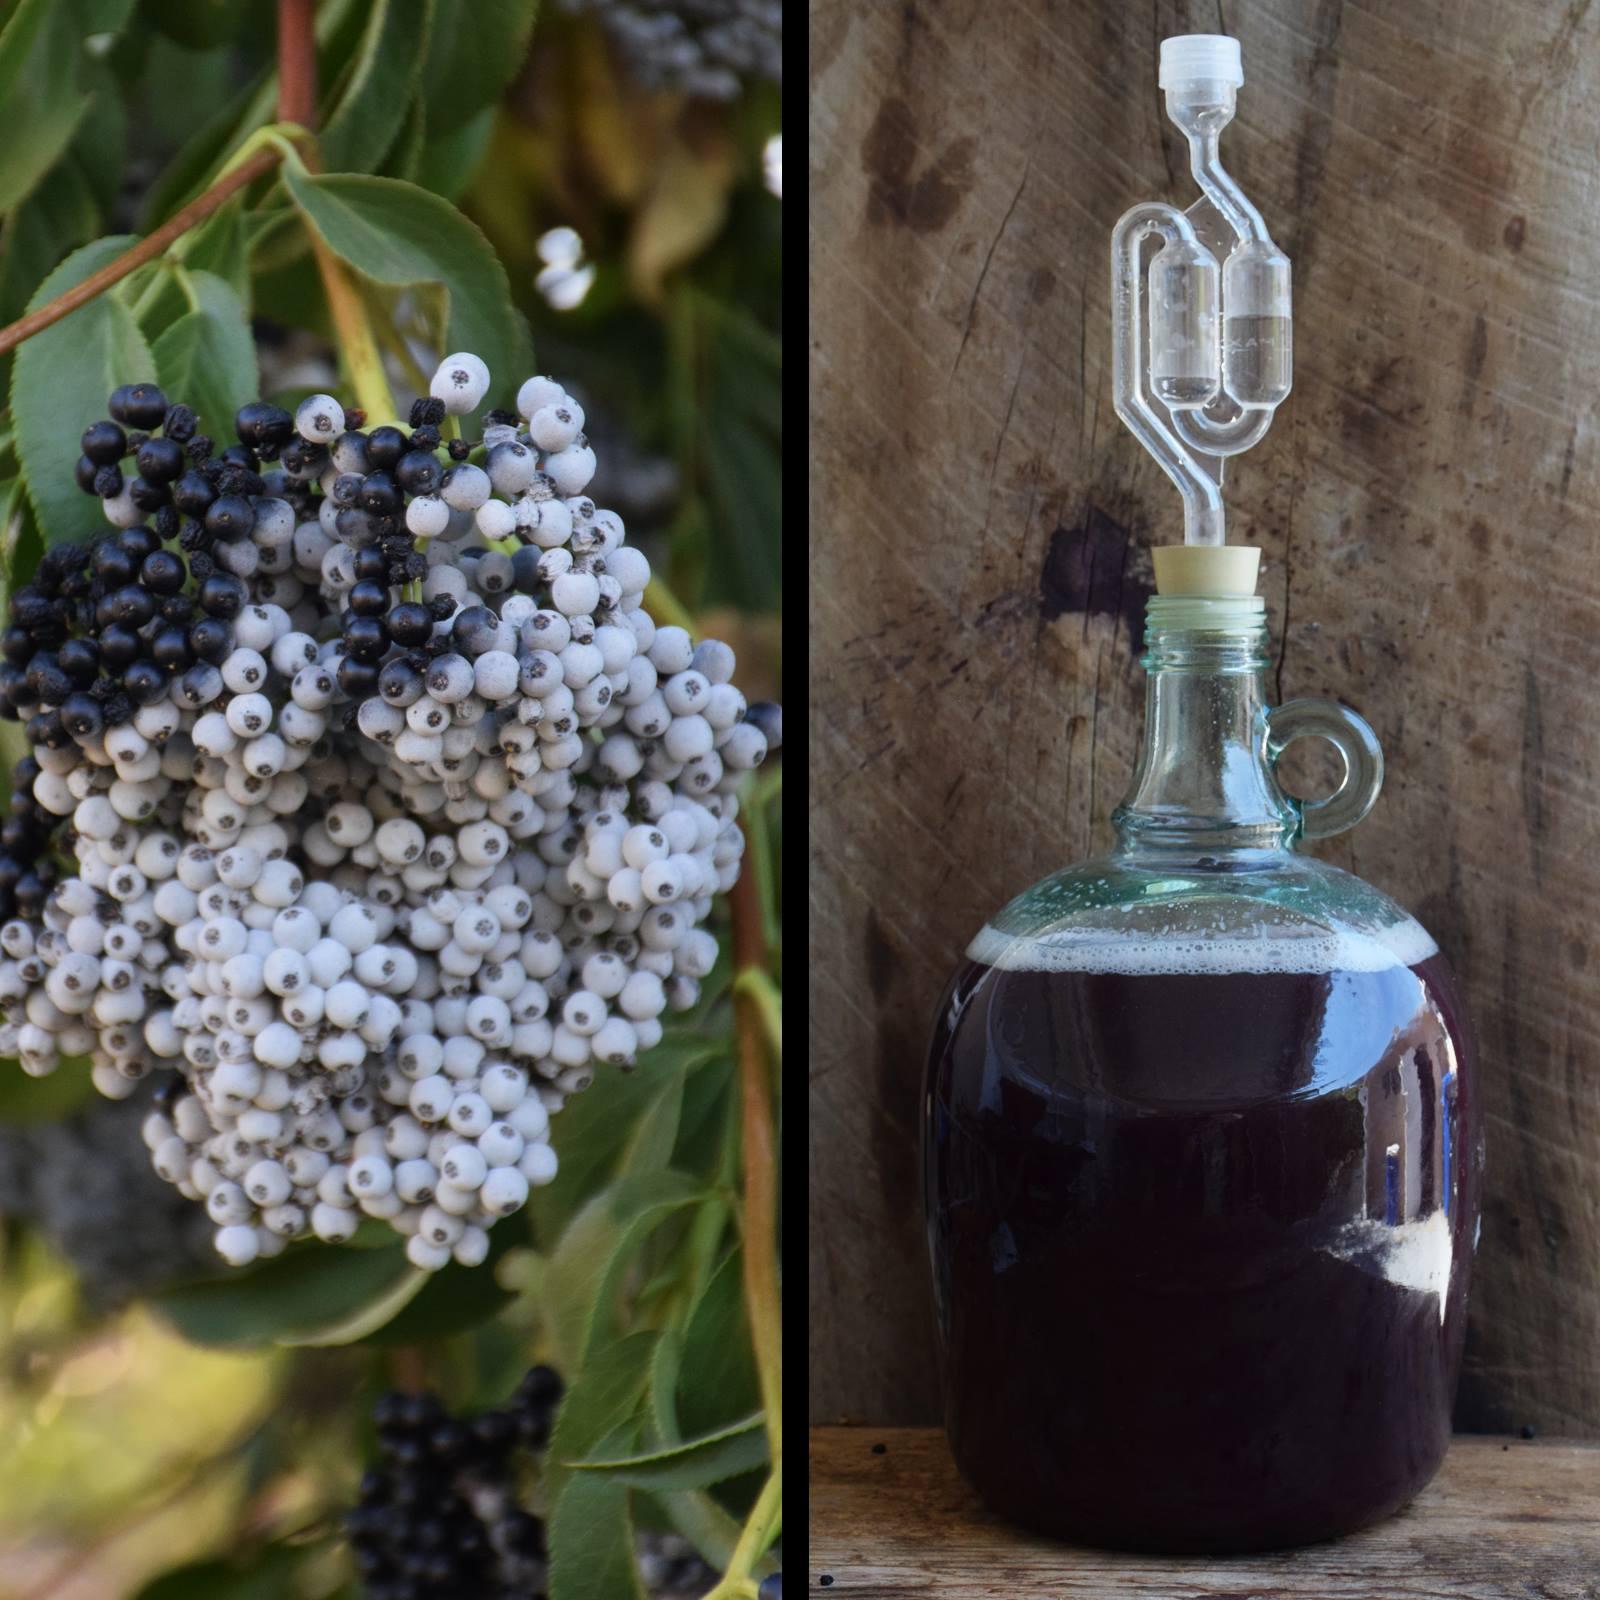 """Raw Country Elderberry Wine"" by Pascal Baudar 2017. https://www.facebook.com/pascal.baudar"